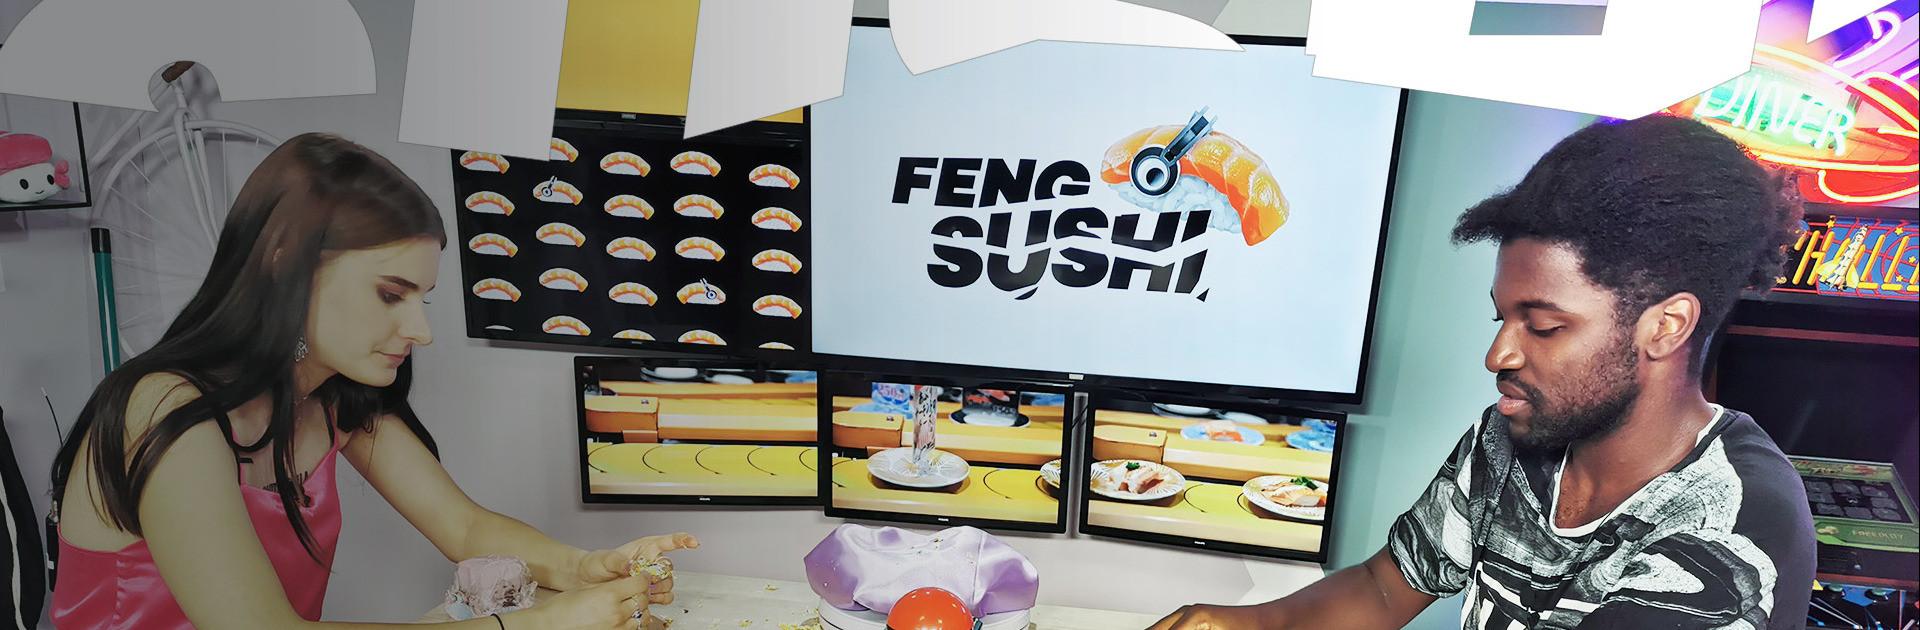 A1 Telekom Austria startet Feng-Sushi